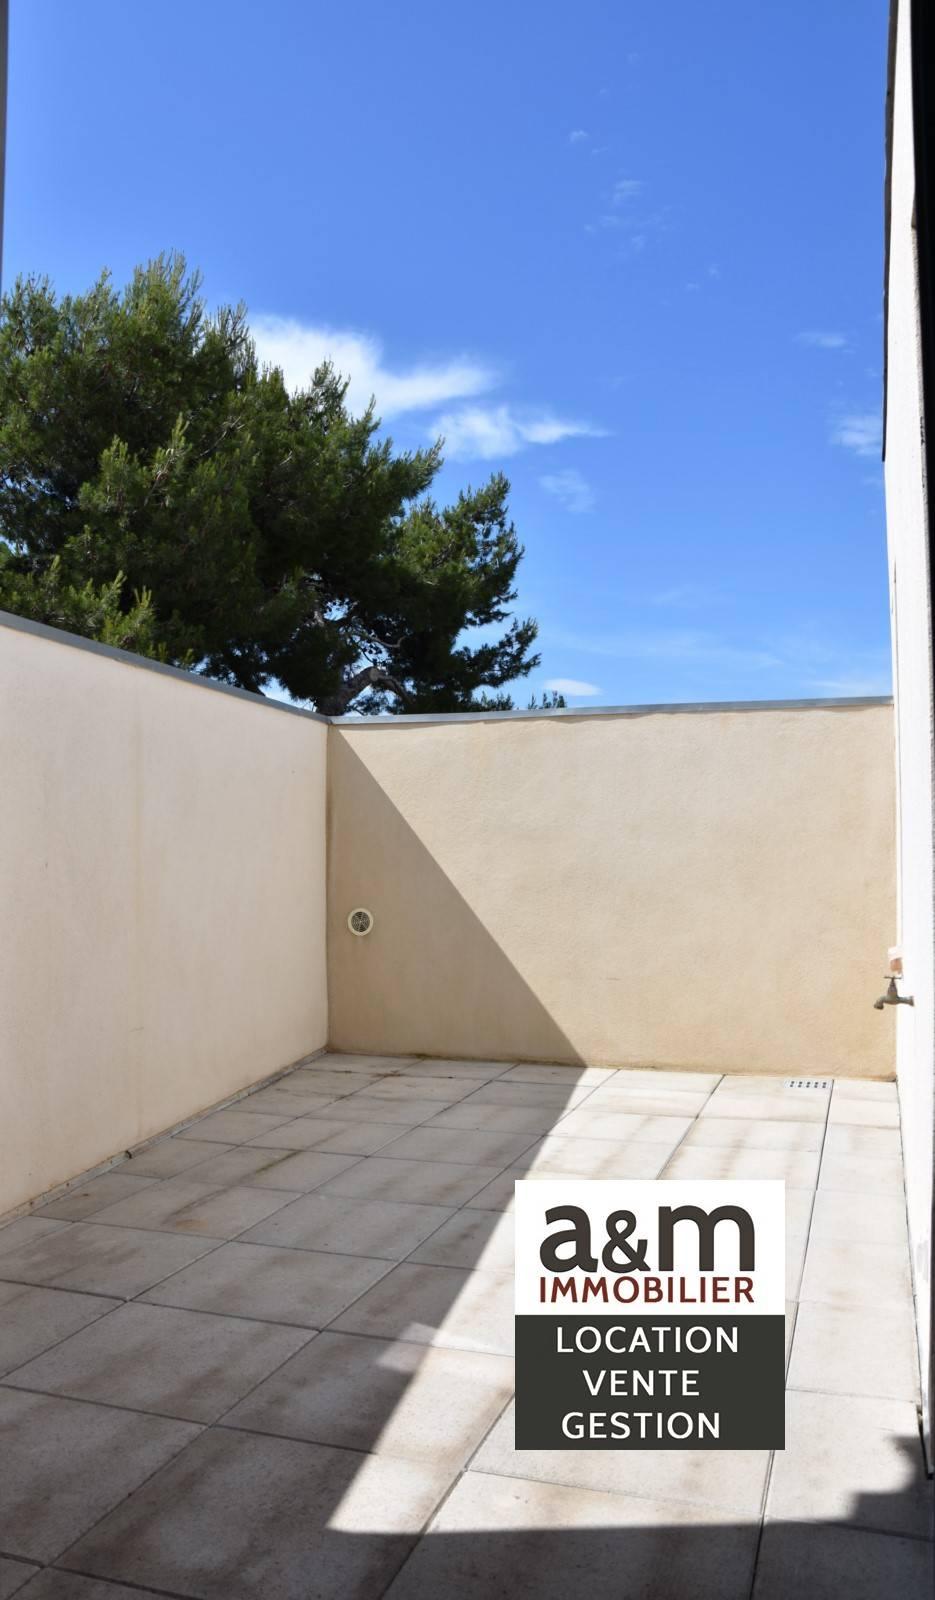 Appartement terrasse garage t3 72 m chateauneuf - Garage chateauneuf les martigues ...